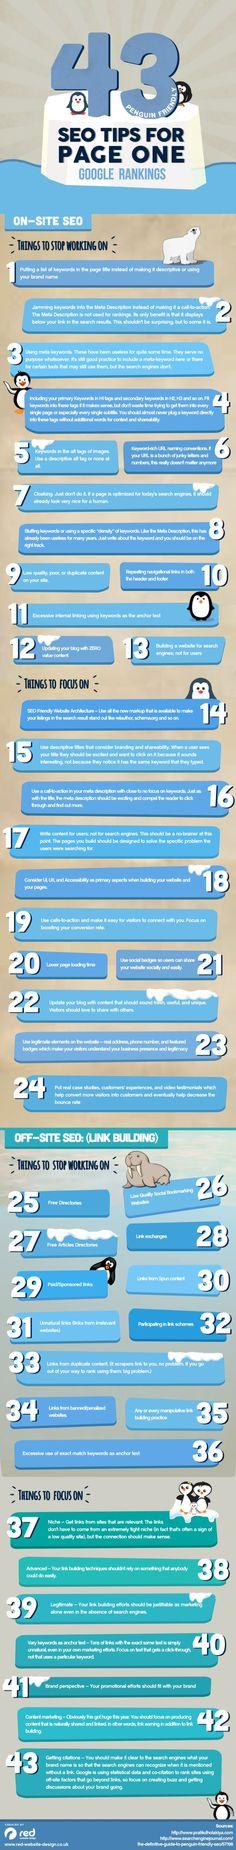 43 consejos SEO #infografia #infographic #seo #searchengineoptimizationadvicegoogle,